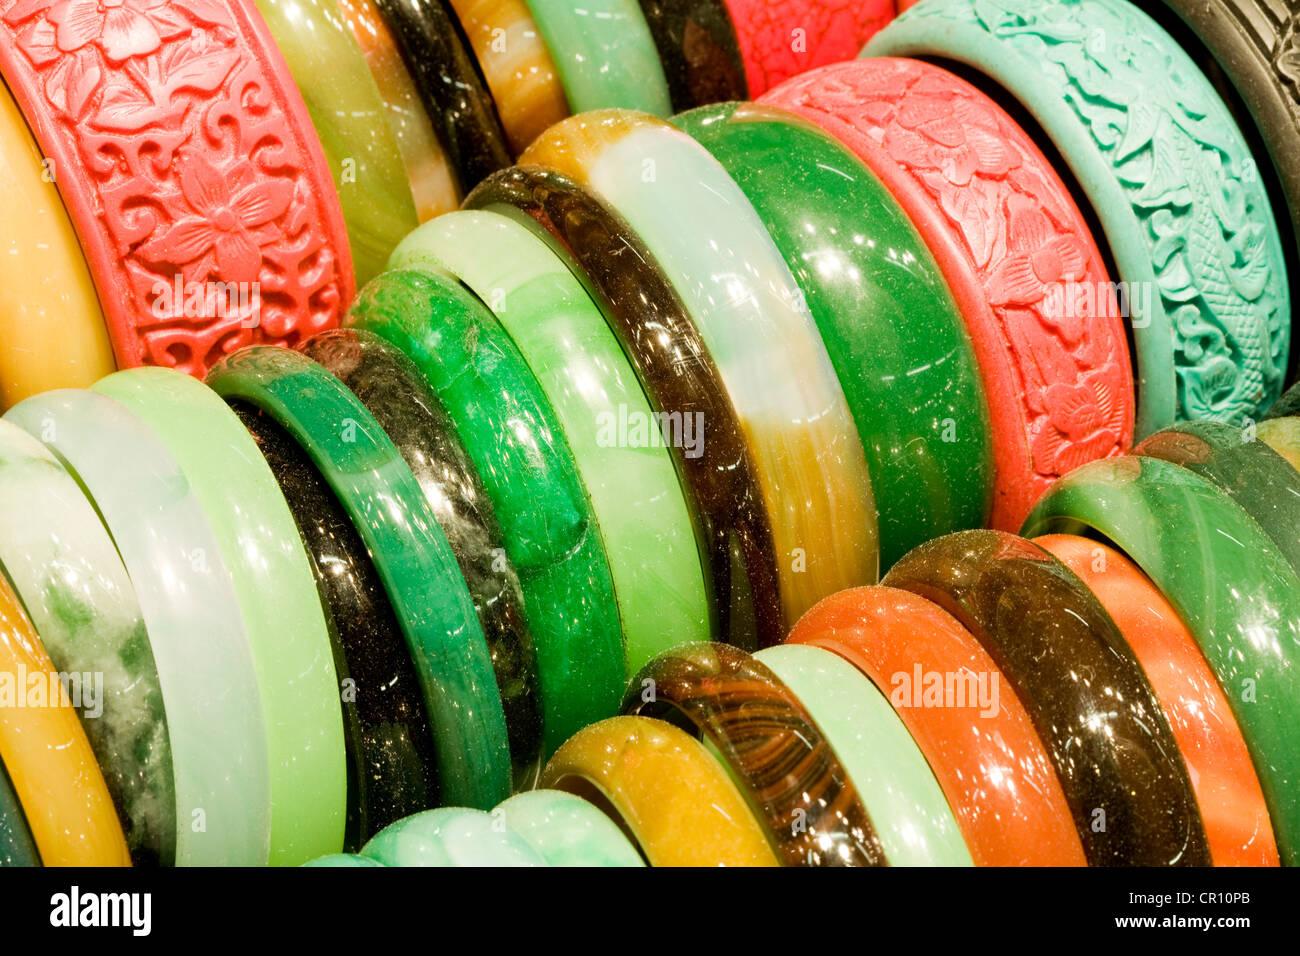 China, Hong Kong, Kowloon, Jade market, jade bracelet - Stock Image